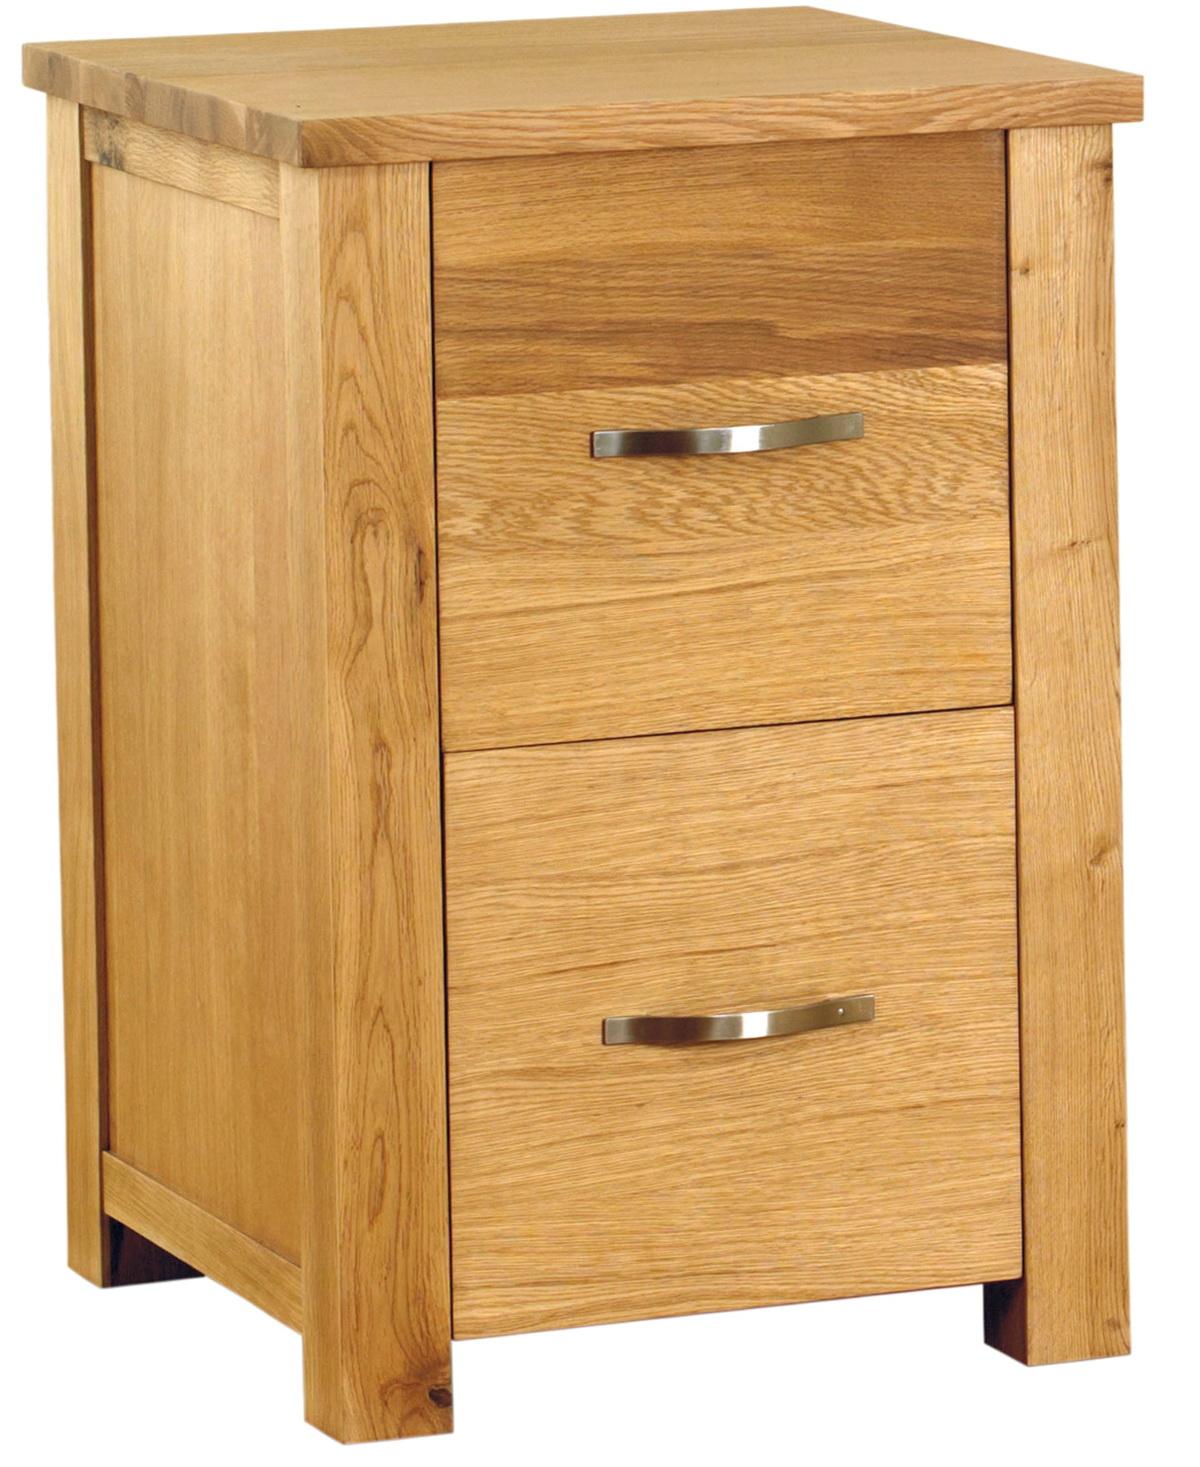 Oak Two Drawer File Cabinet